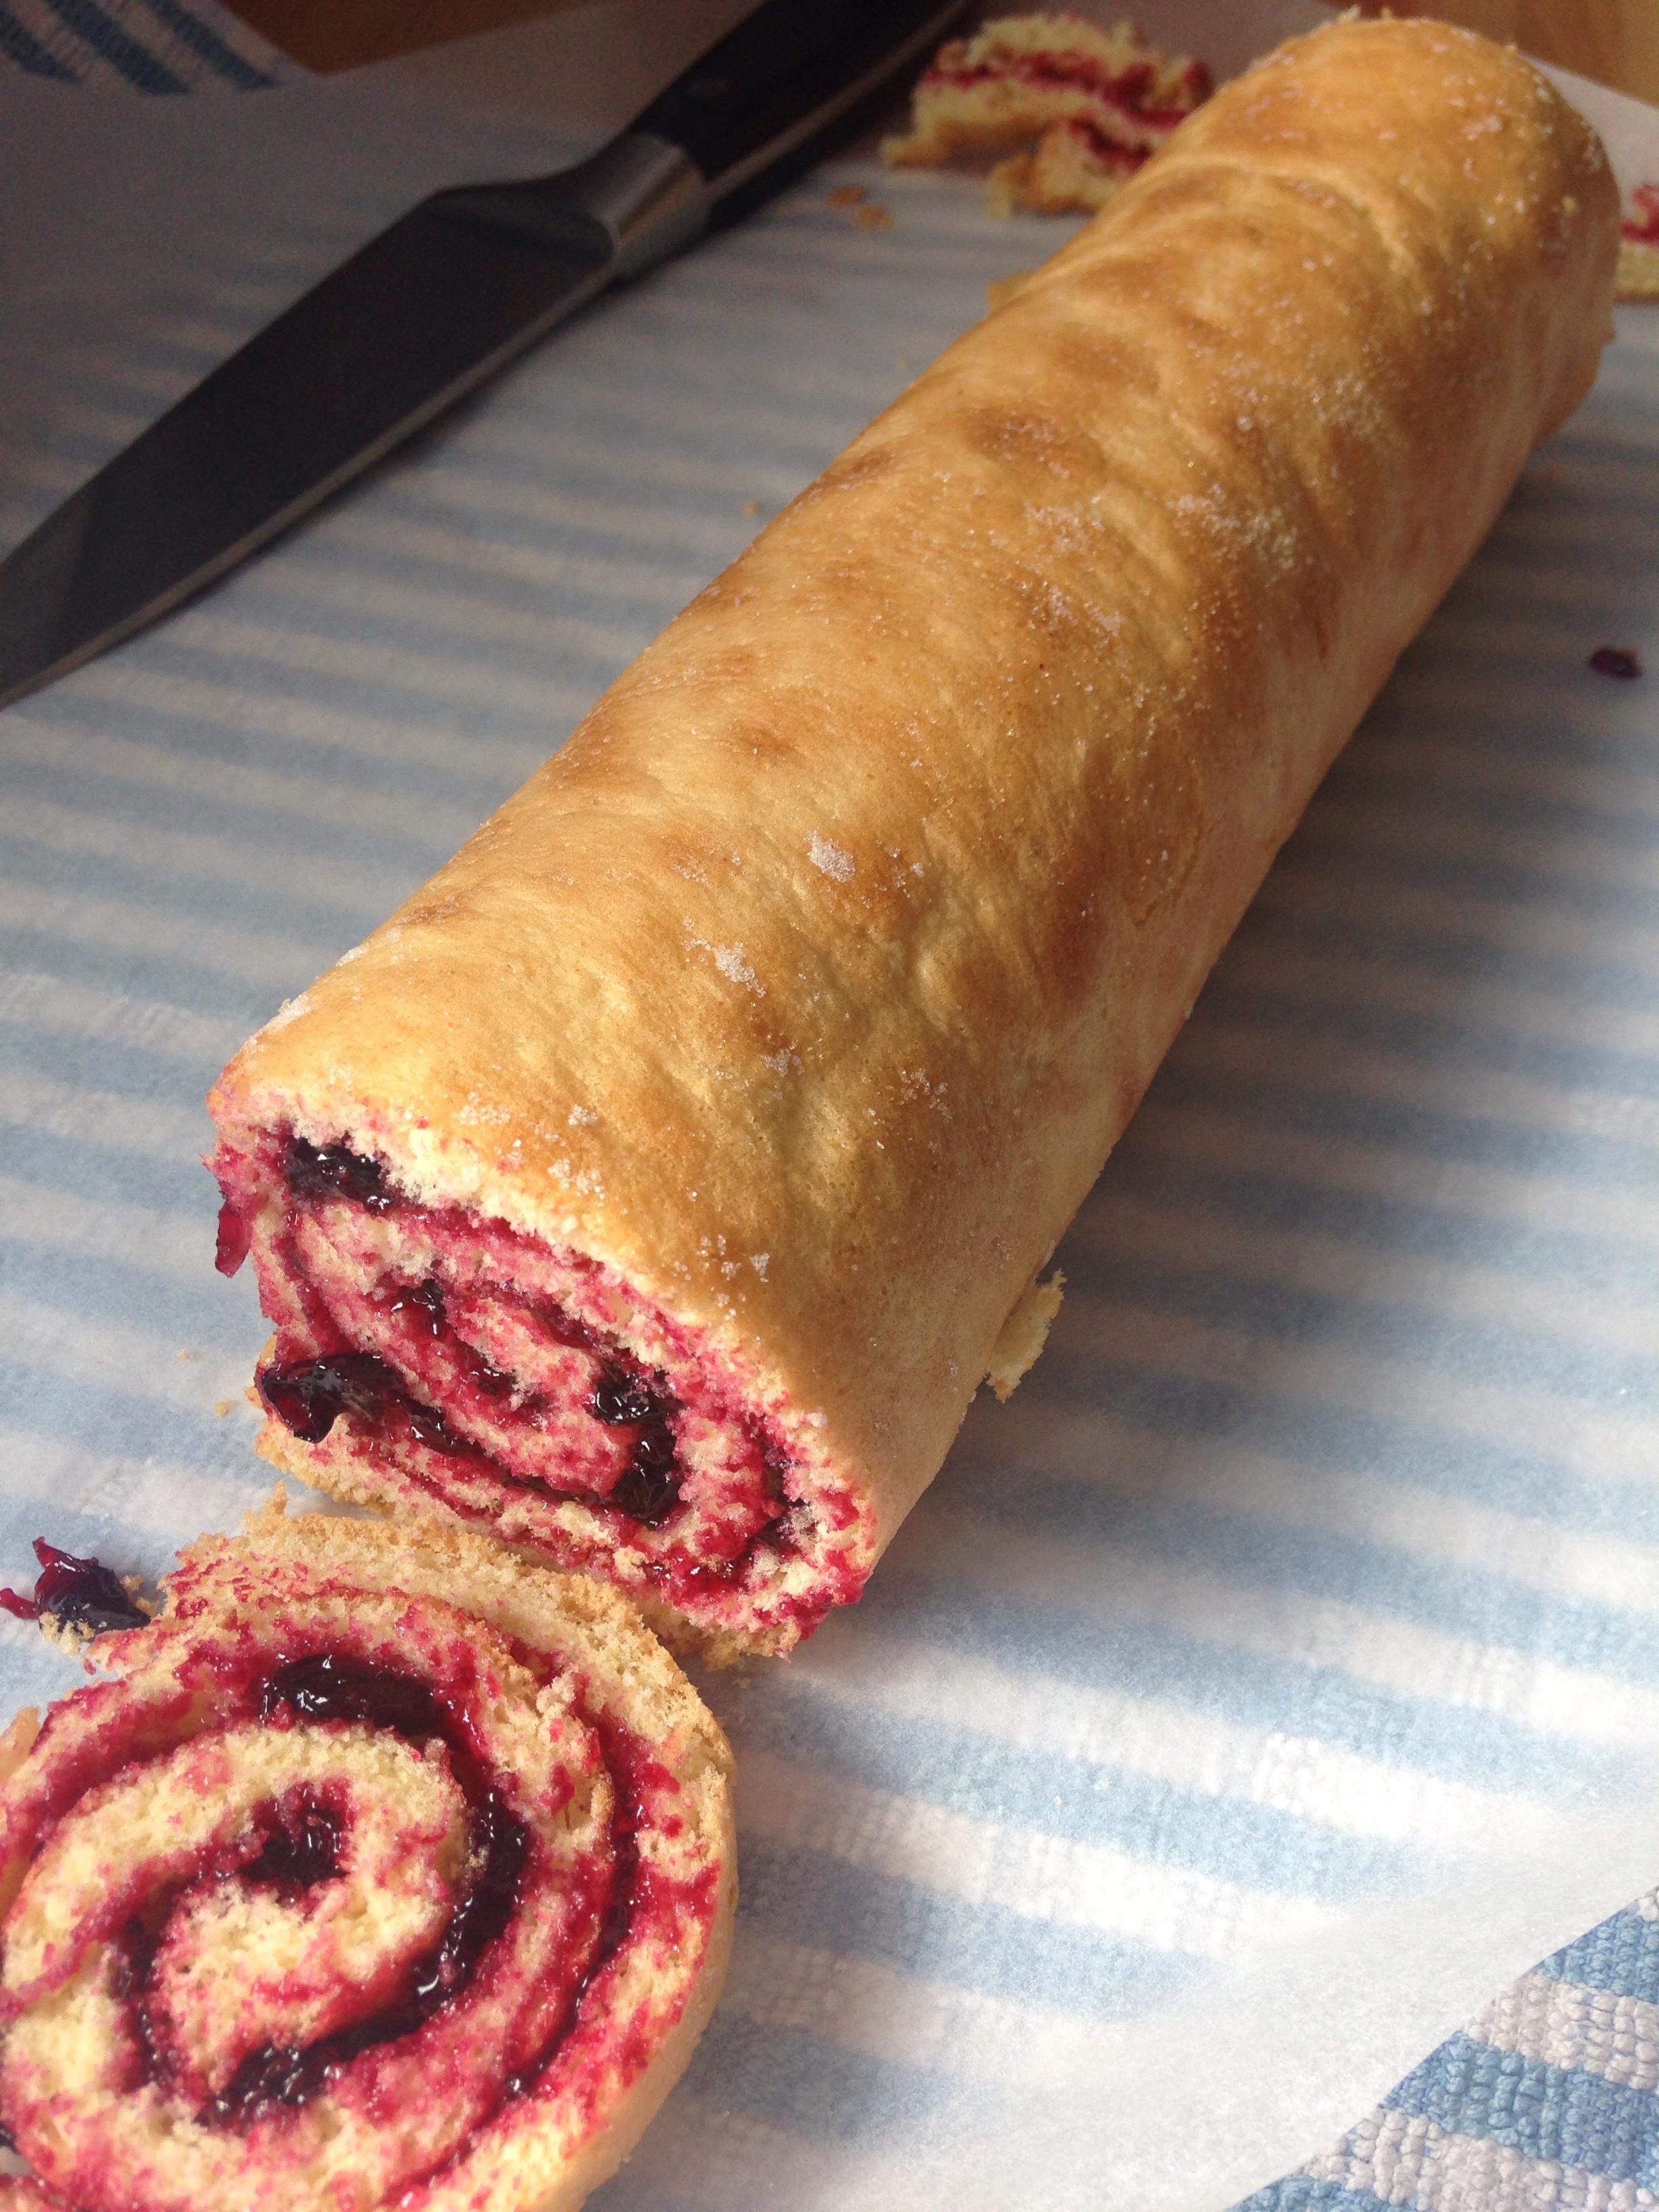 Homemade Swiss roll with homemade Blackcurrant jam.